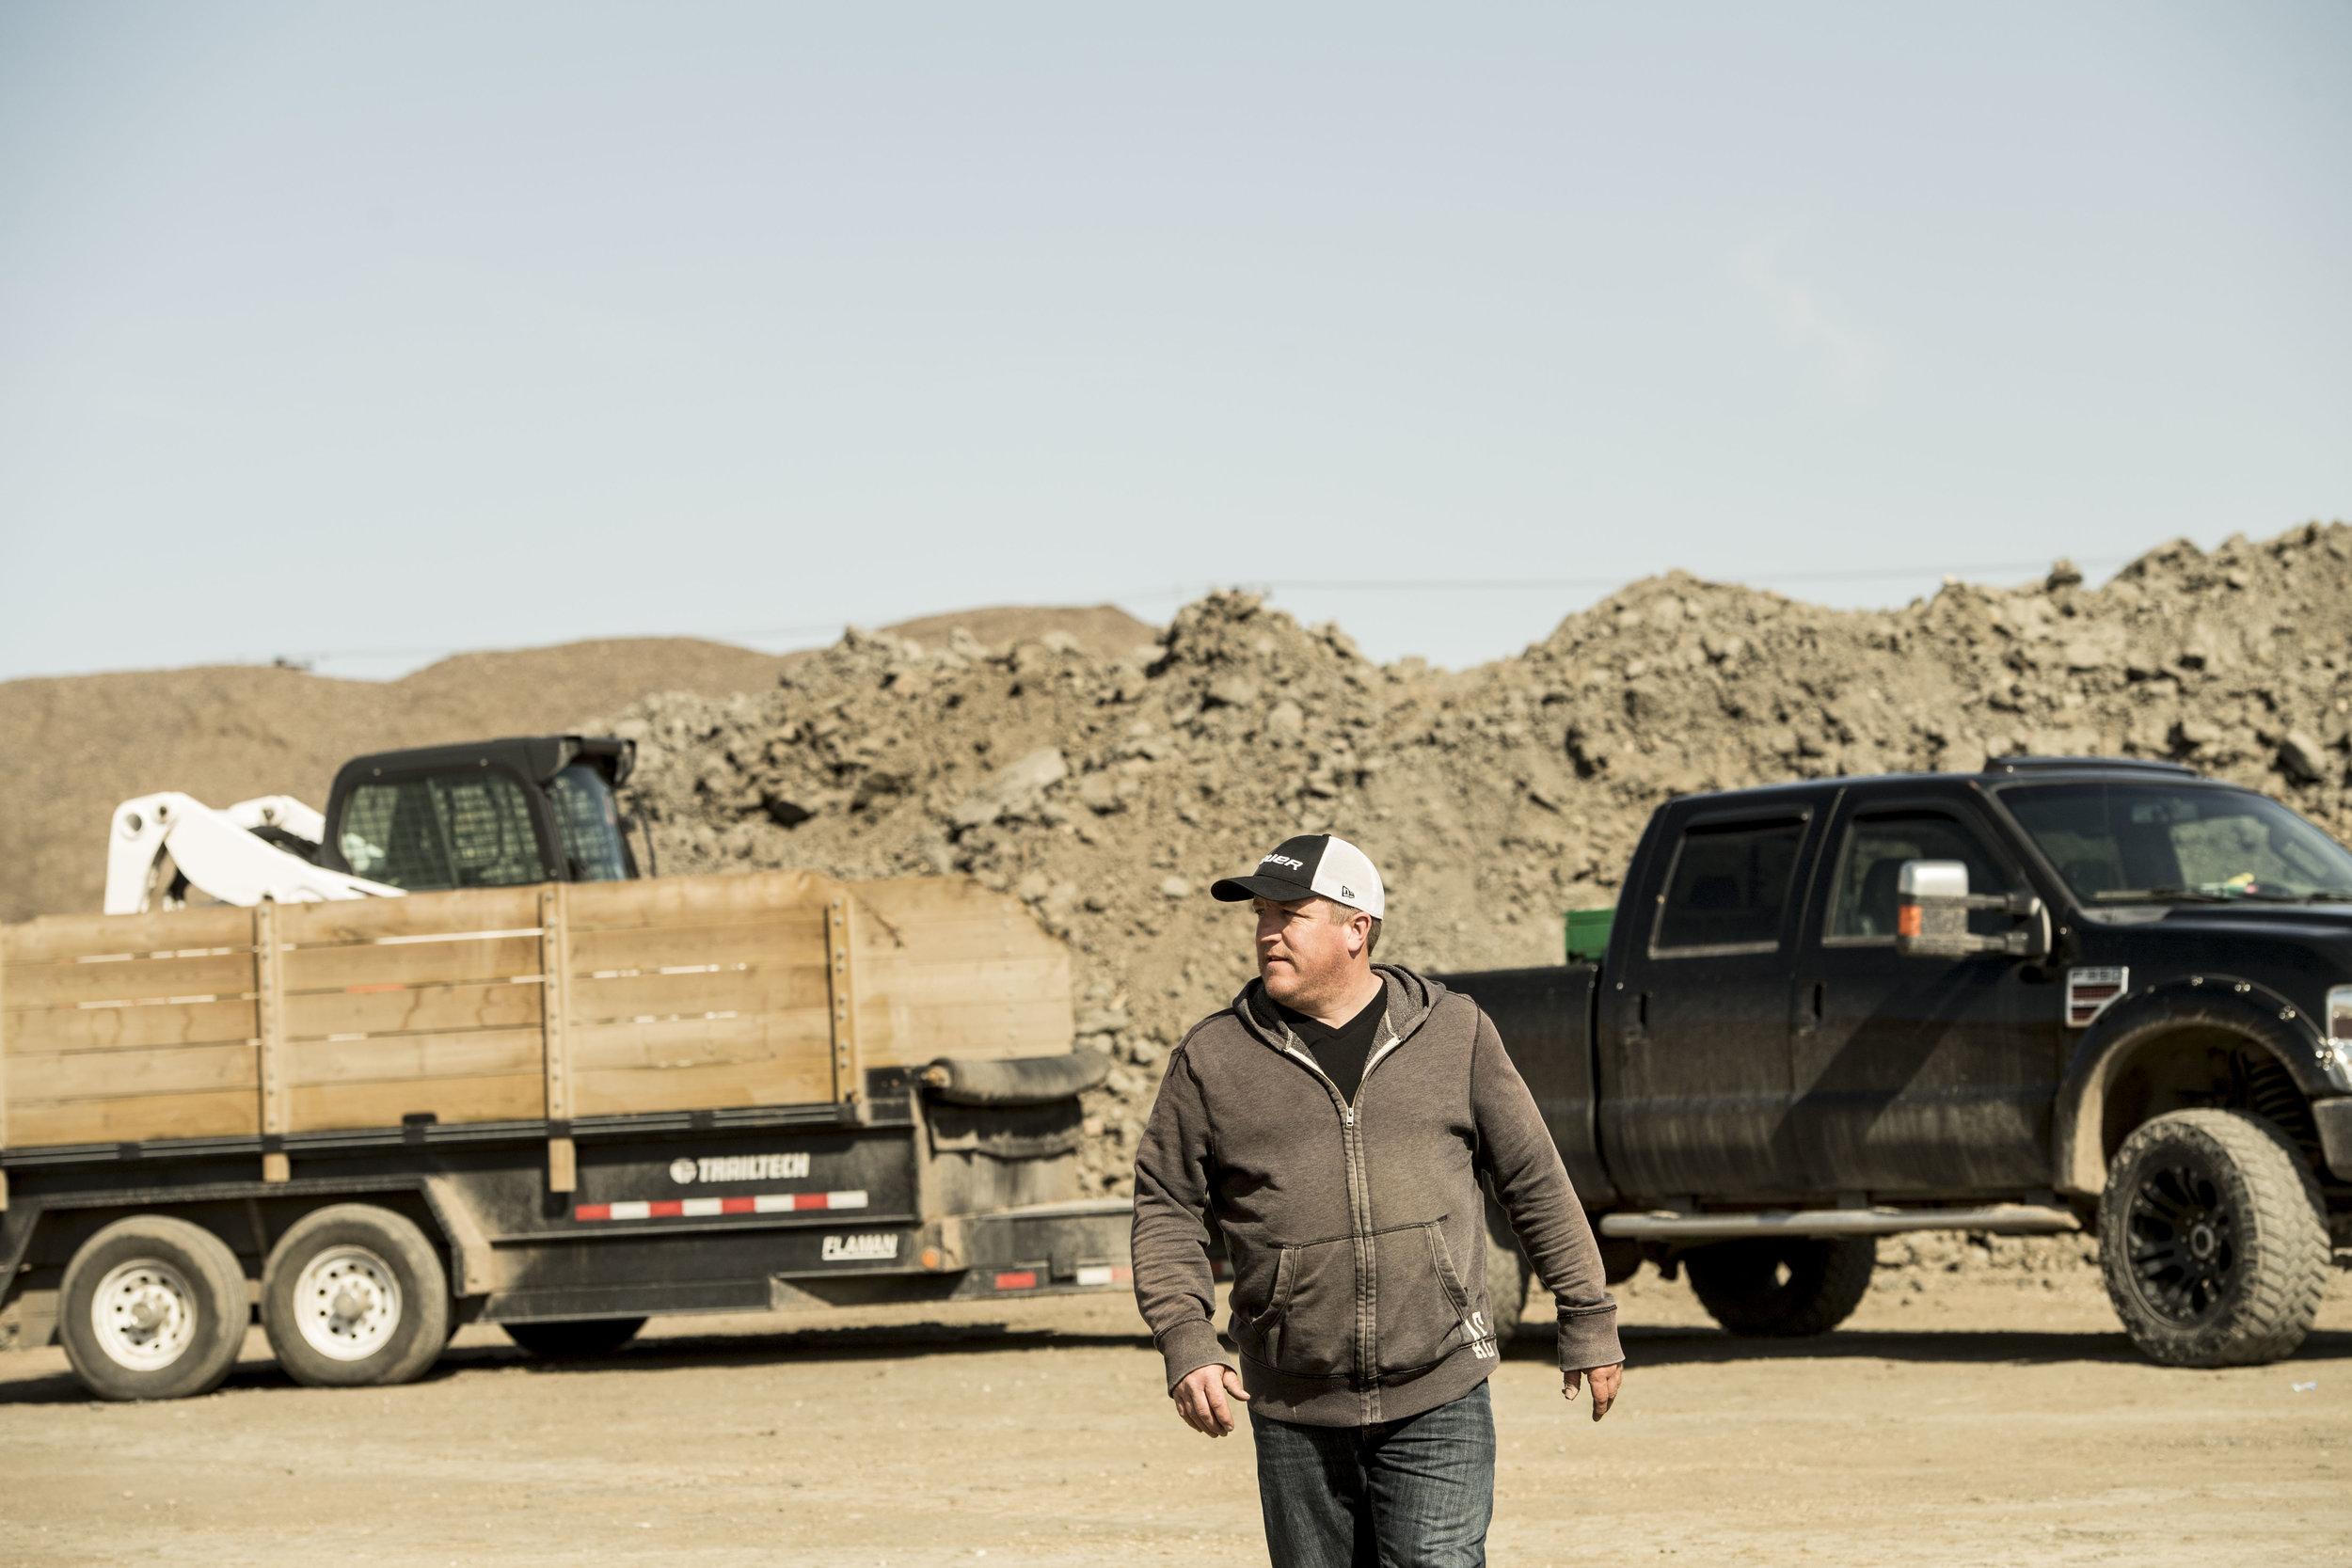 Saskatoon Landscaping, Excavating